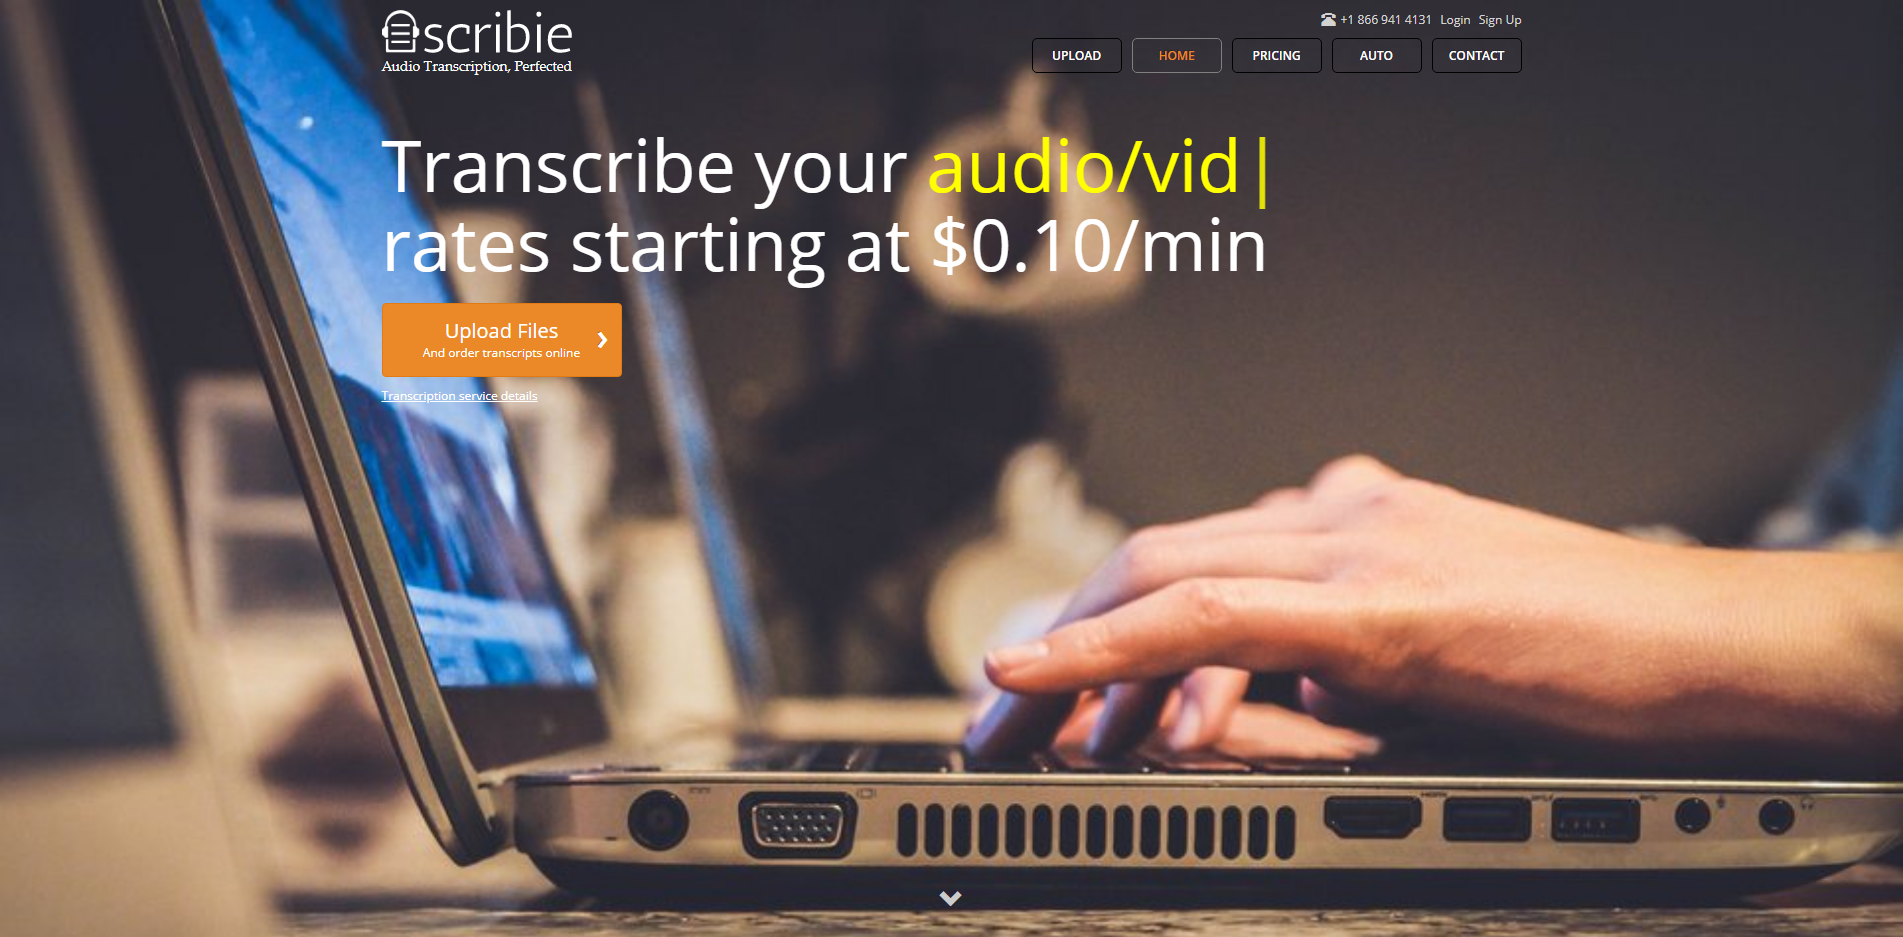 Scribie Audio Video Transcription Starting at $0.10 min